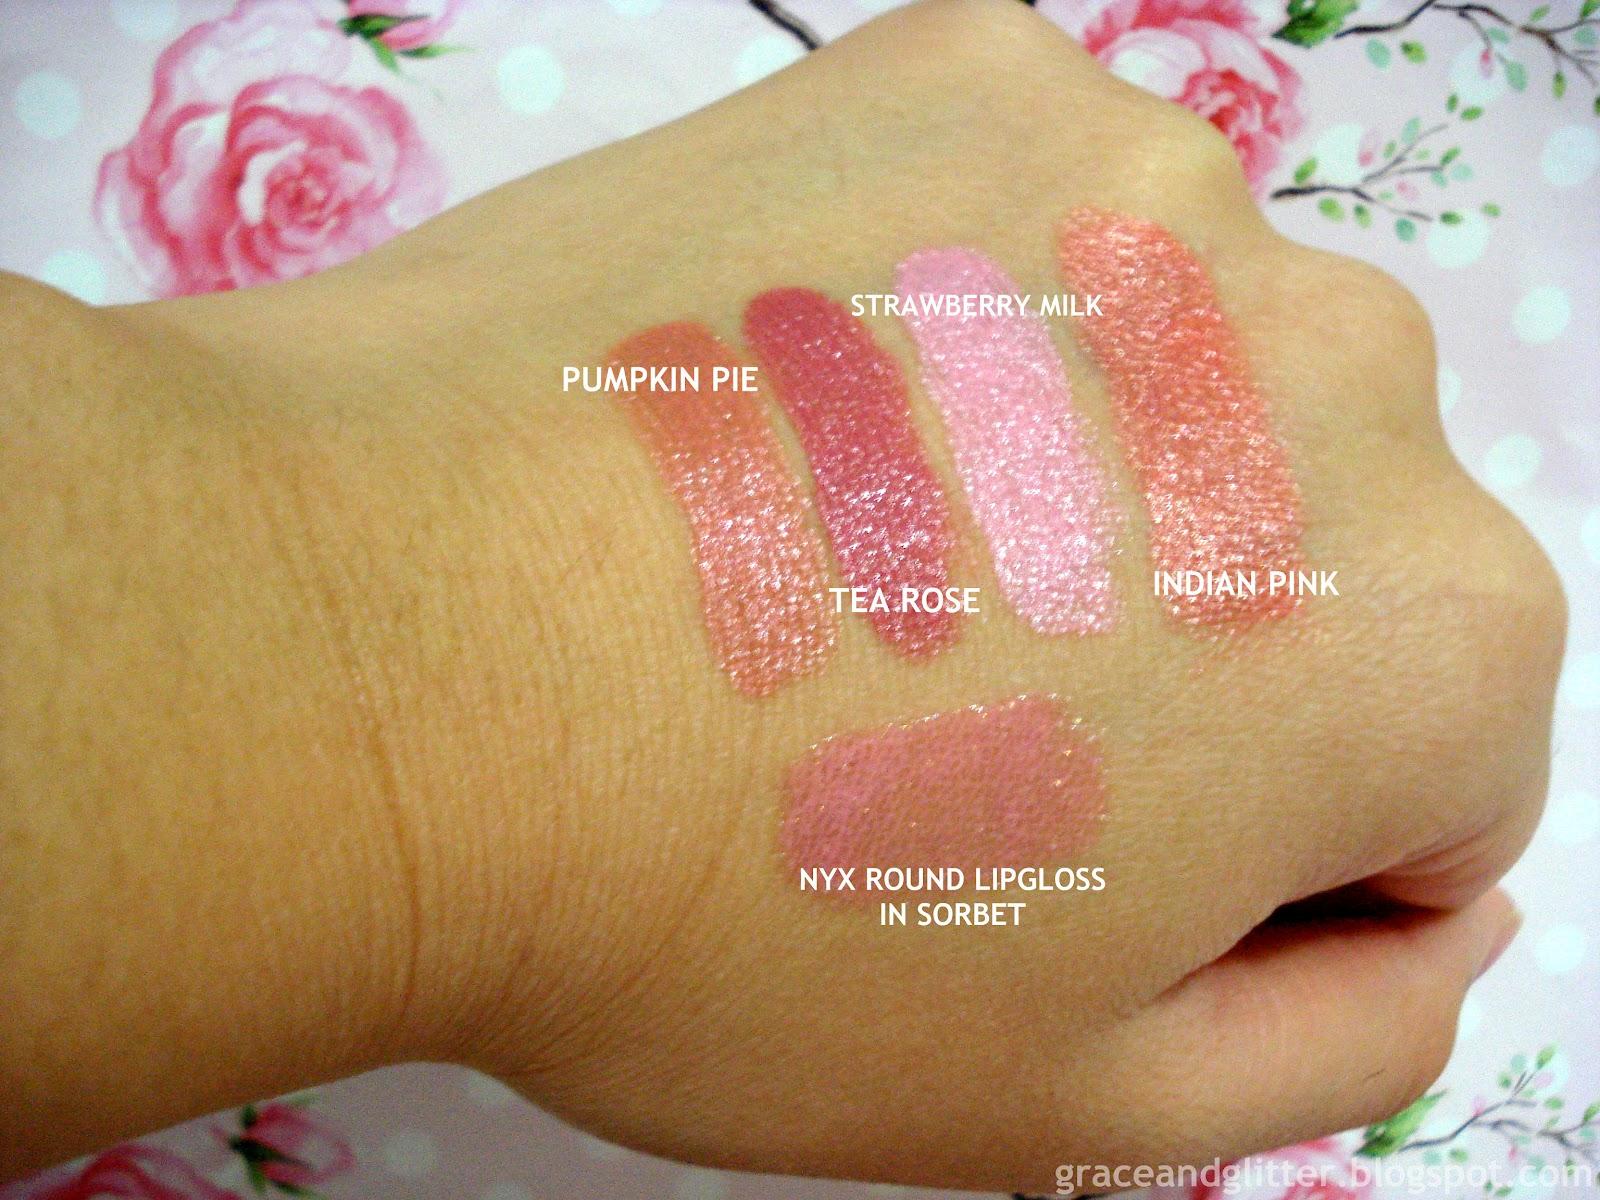 http://2.bp.blogspot.com/-CaTM9wSPrHI/T-cX6uTZI3I/AAAAAAAAAPU/X3uUBgu_7B0/s1600/NYX-Round-Lipsticks-and-Round-Lipgloss-Swatch.jpg